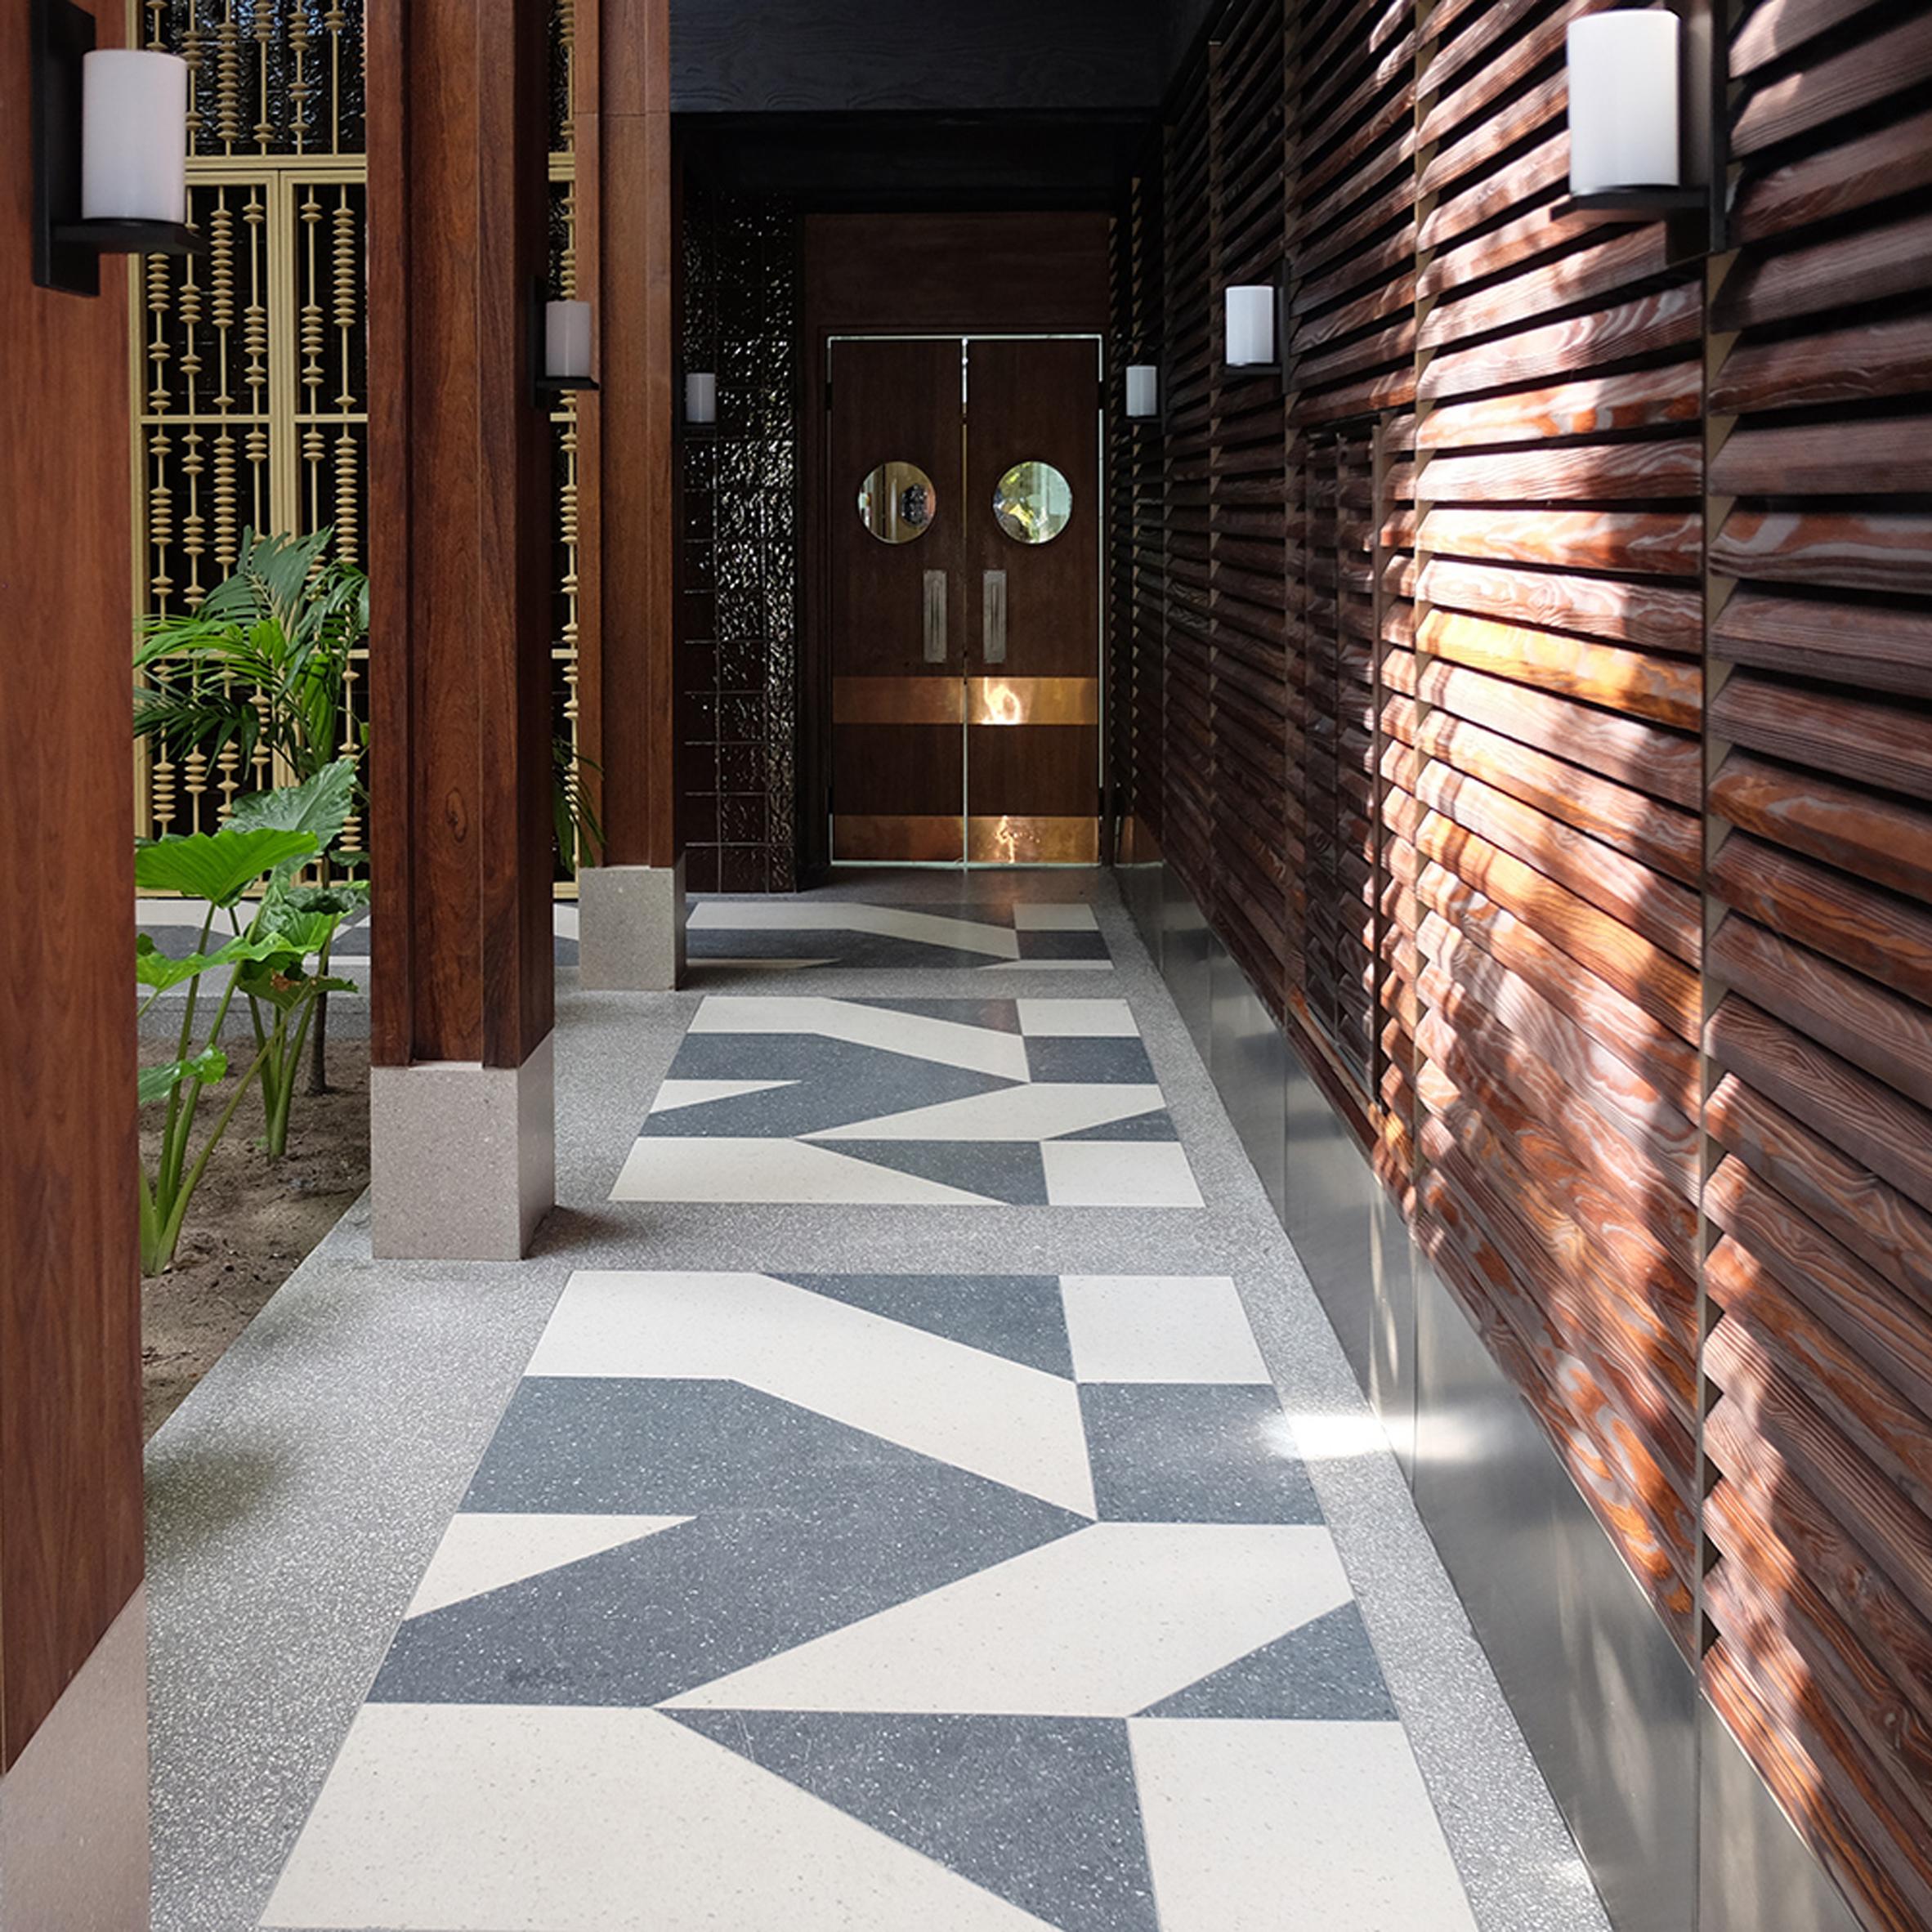 Lixio Plus flooring by Ideal Work